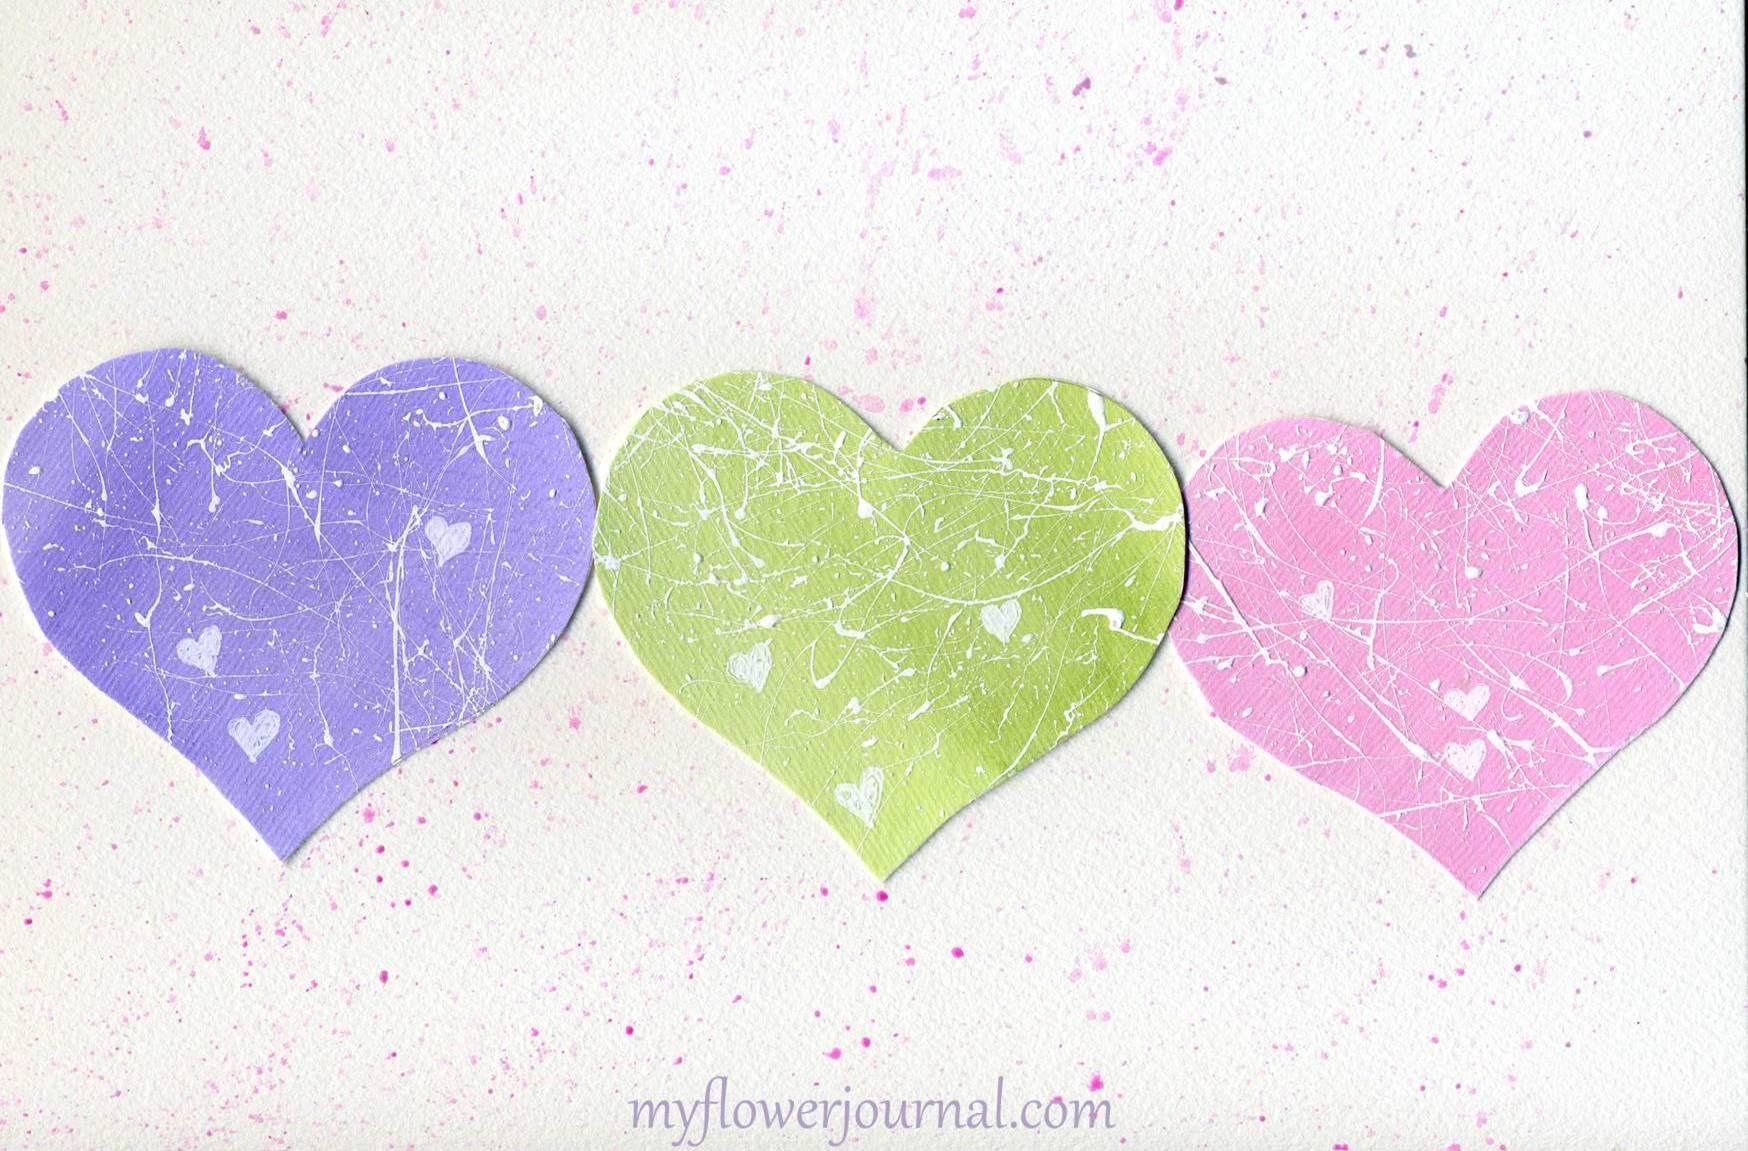 A Pastel Splattered Hearts For